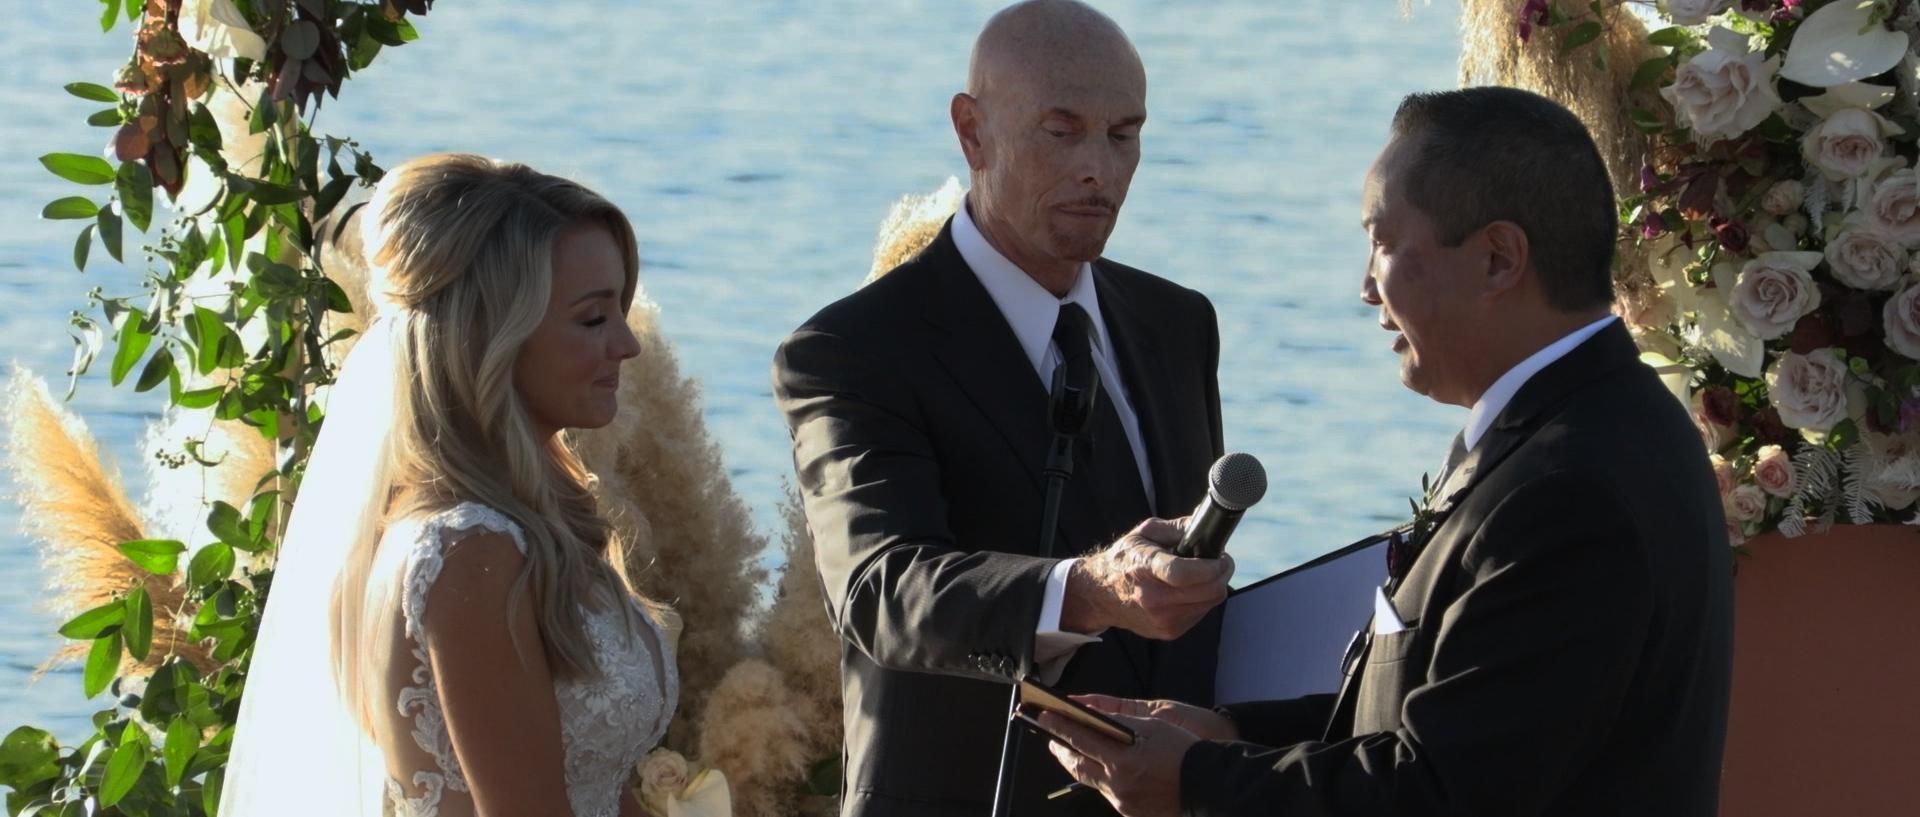 Jessica and Jeffrey Wedding Story.06_37_09_21.Still023.jpg